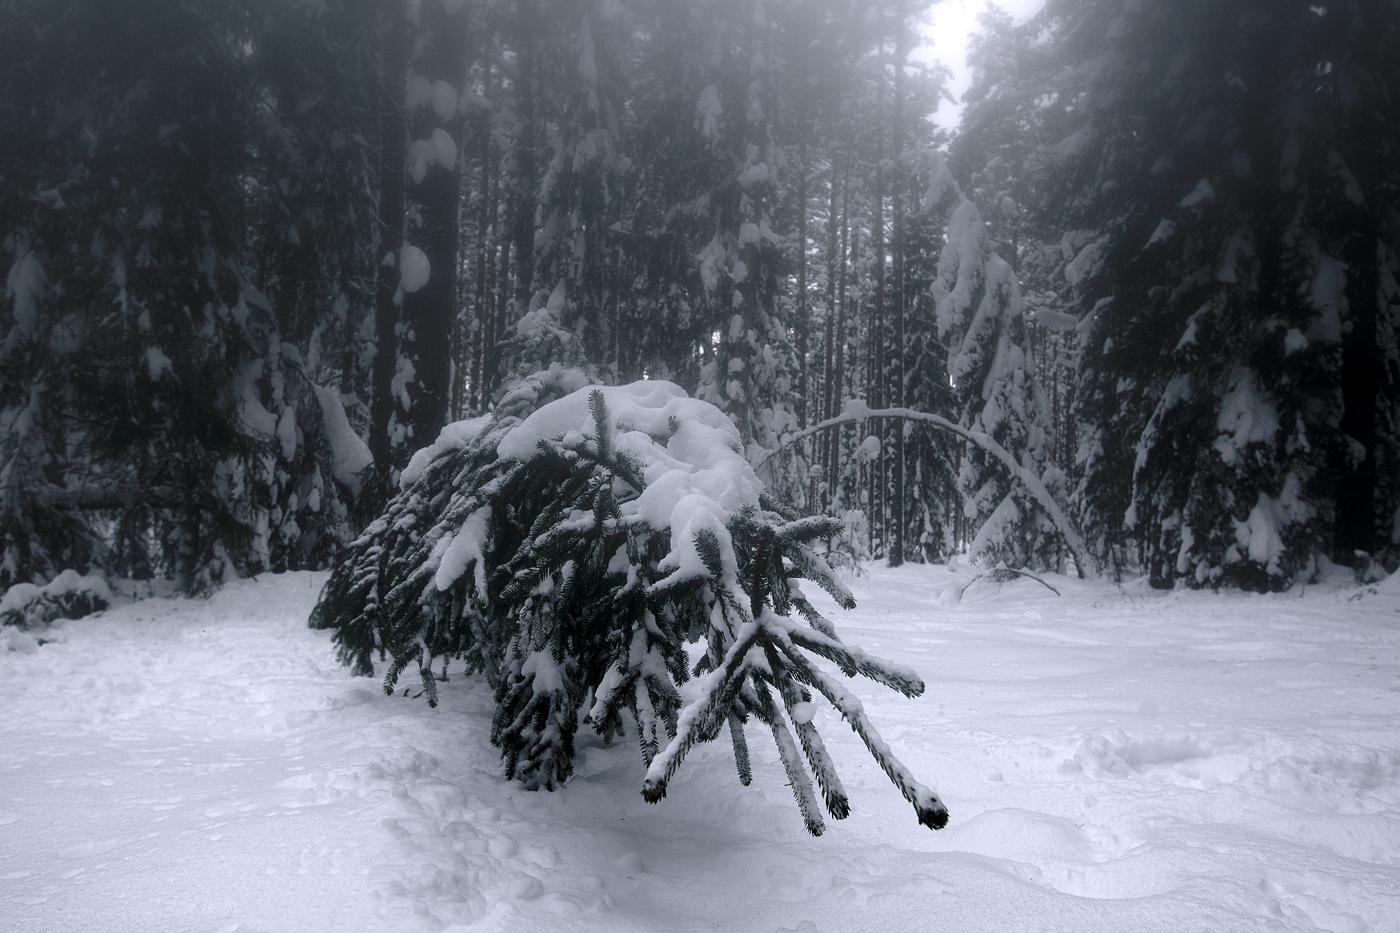 Liiga palju lund